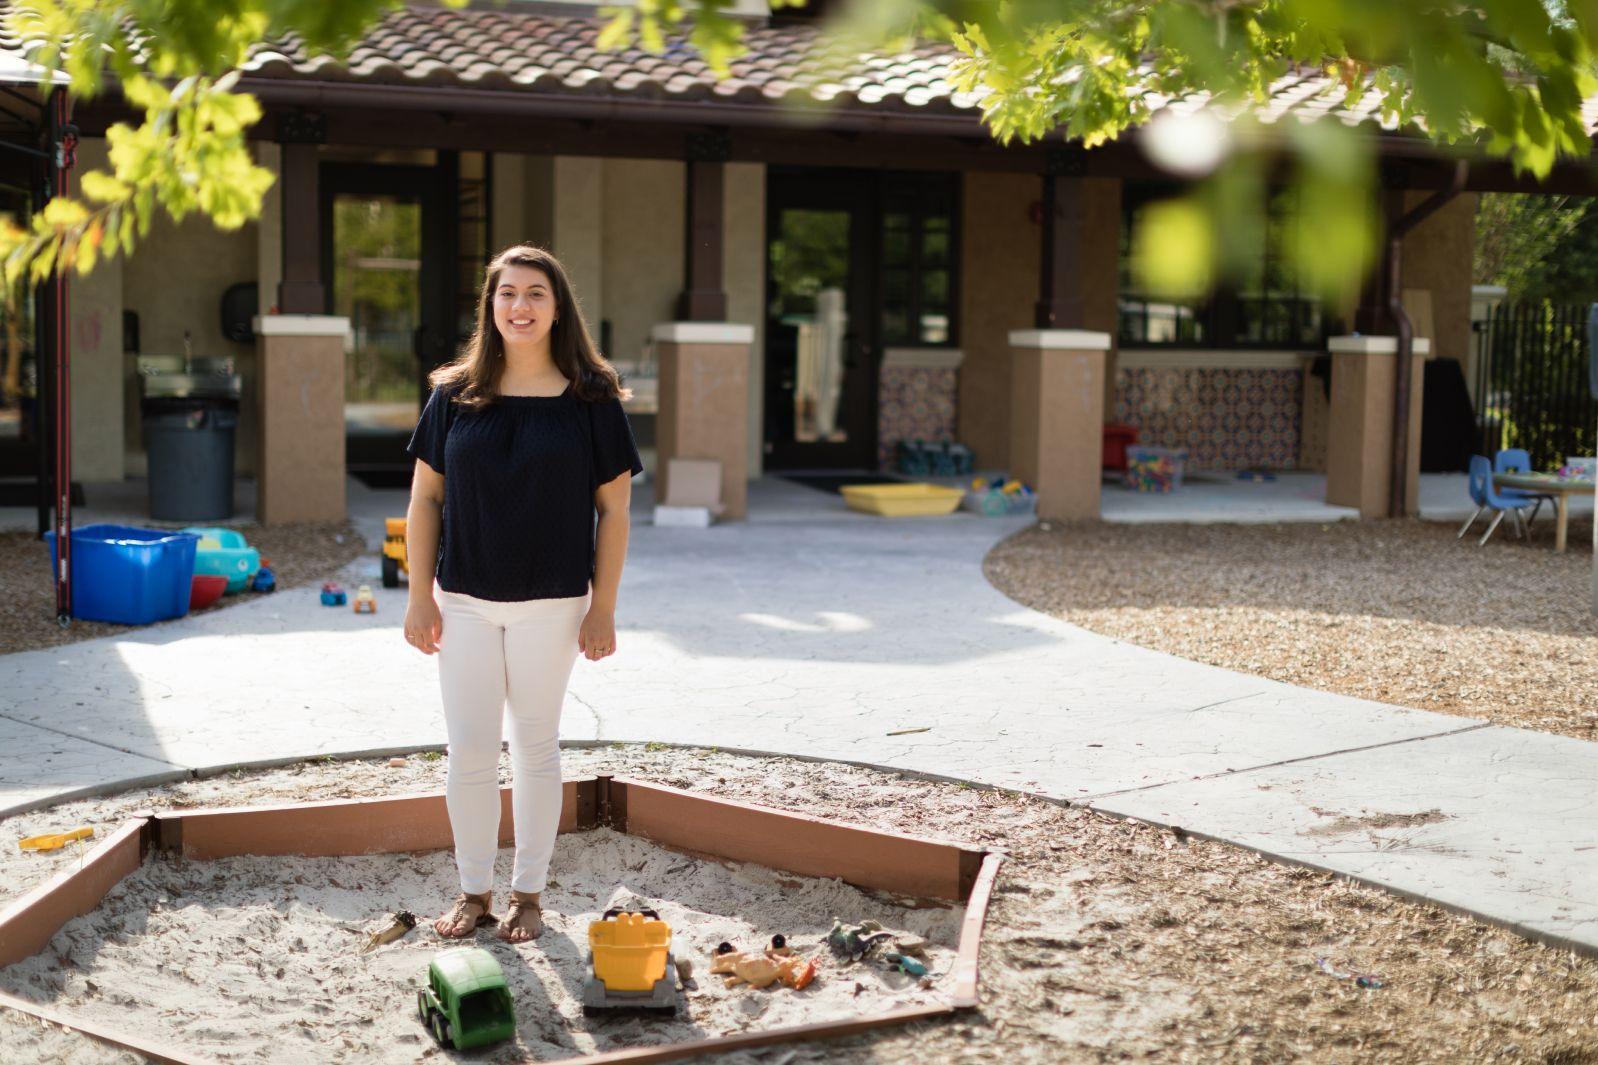 Alexandria Tomkunas '18 sits on the edge of a sandbox